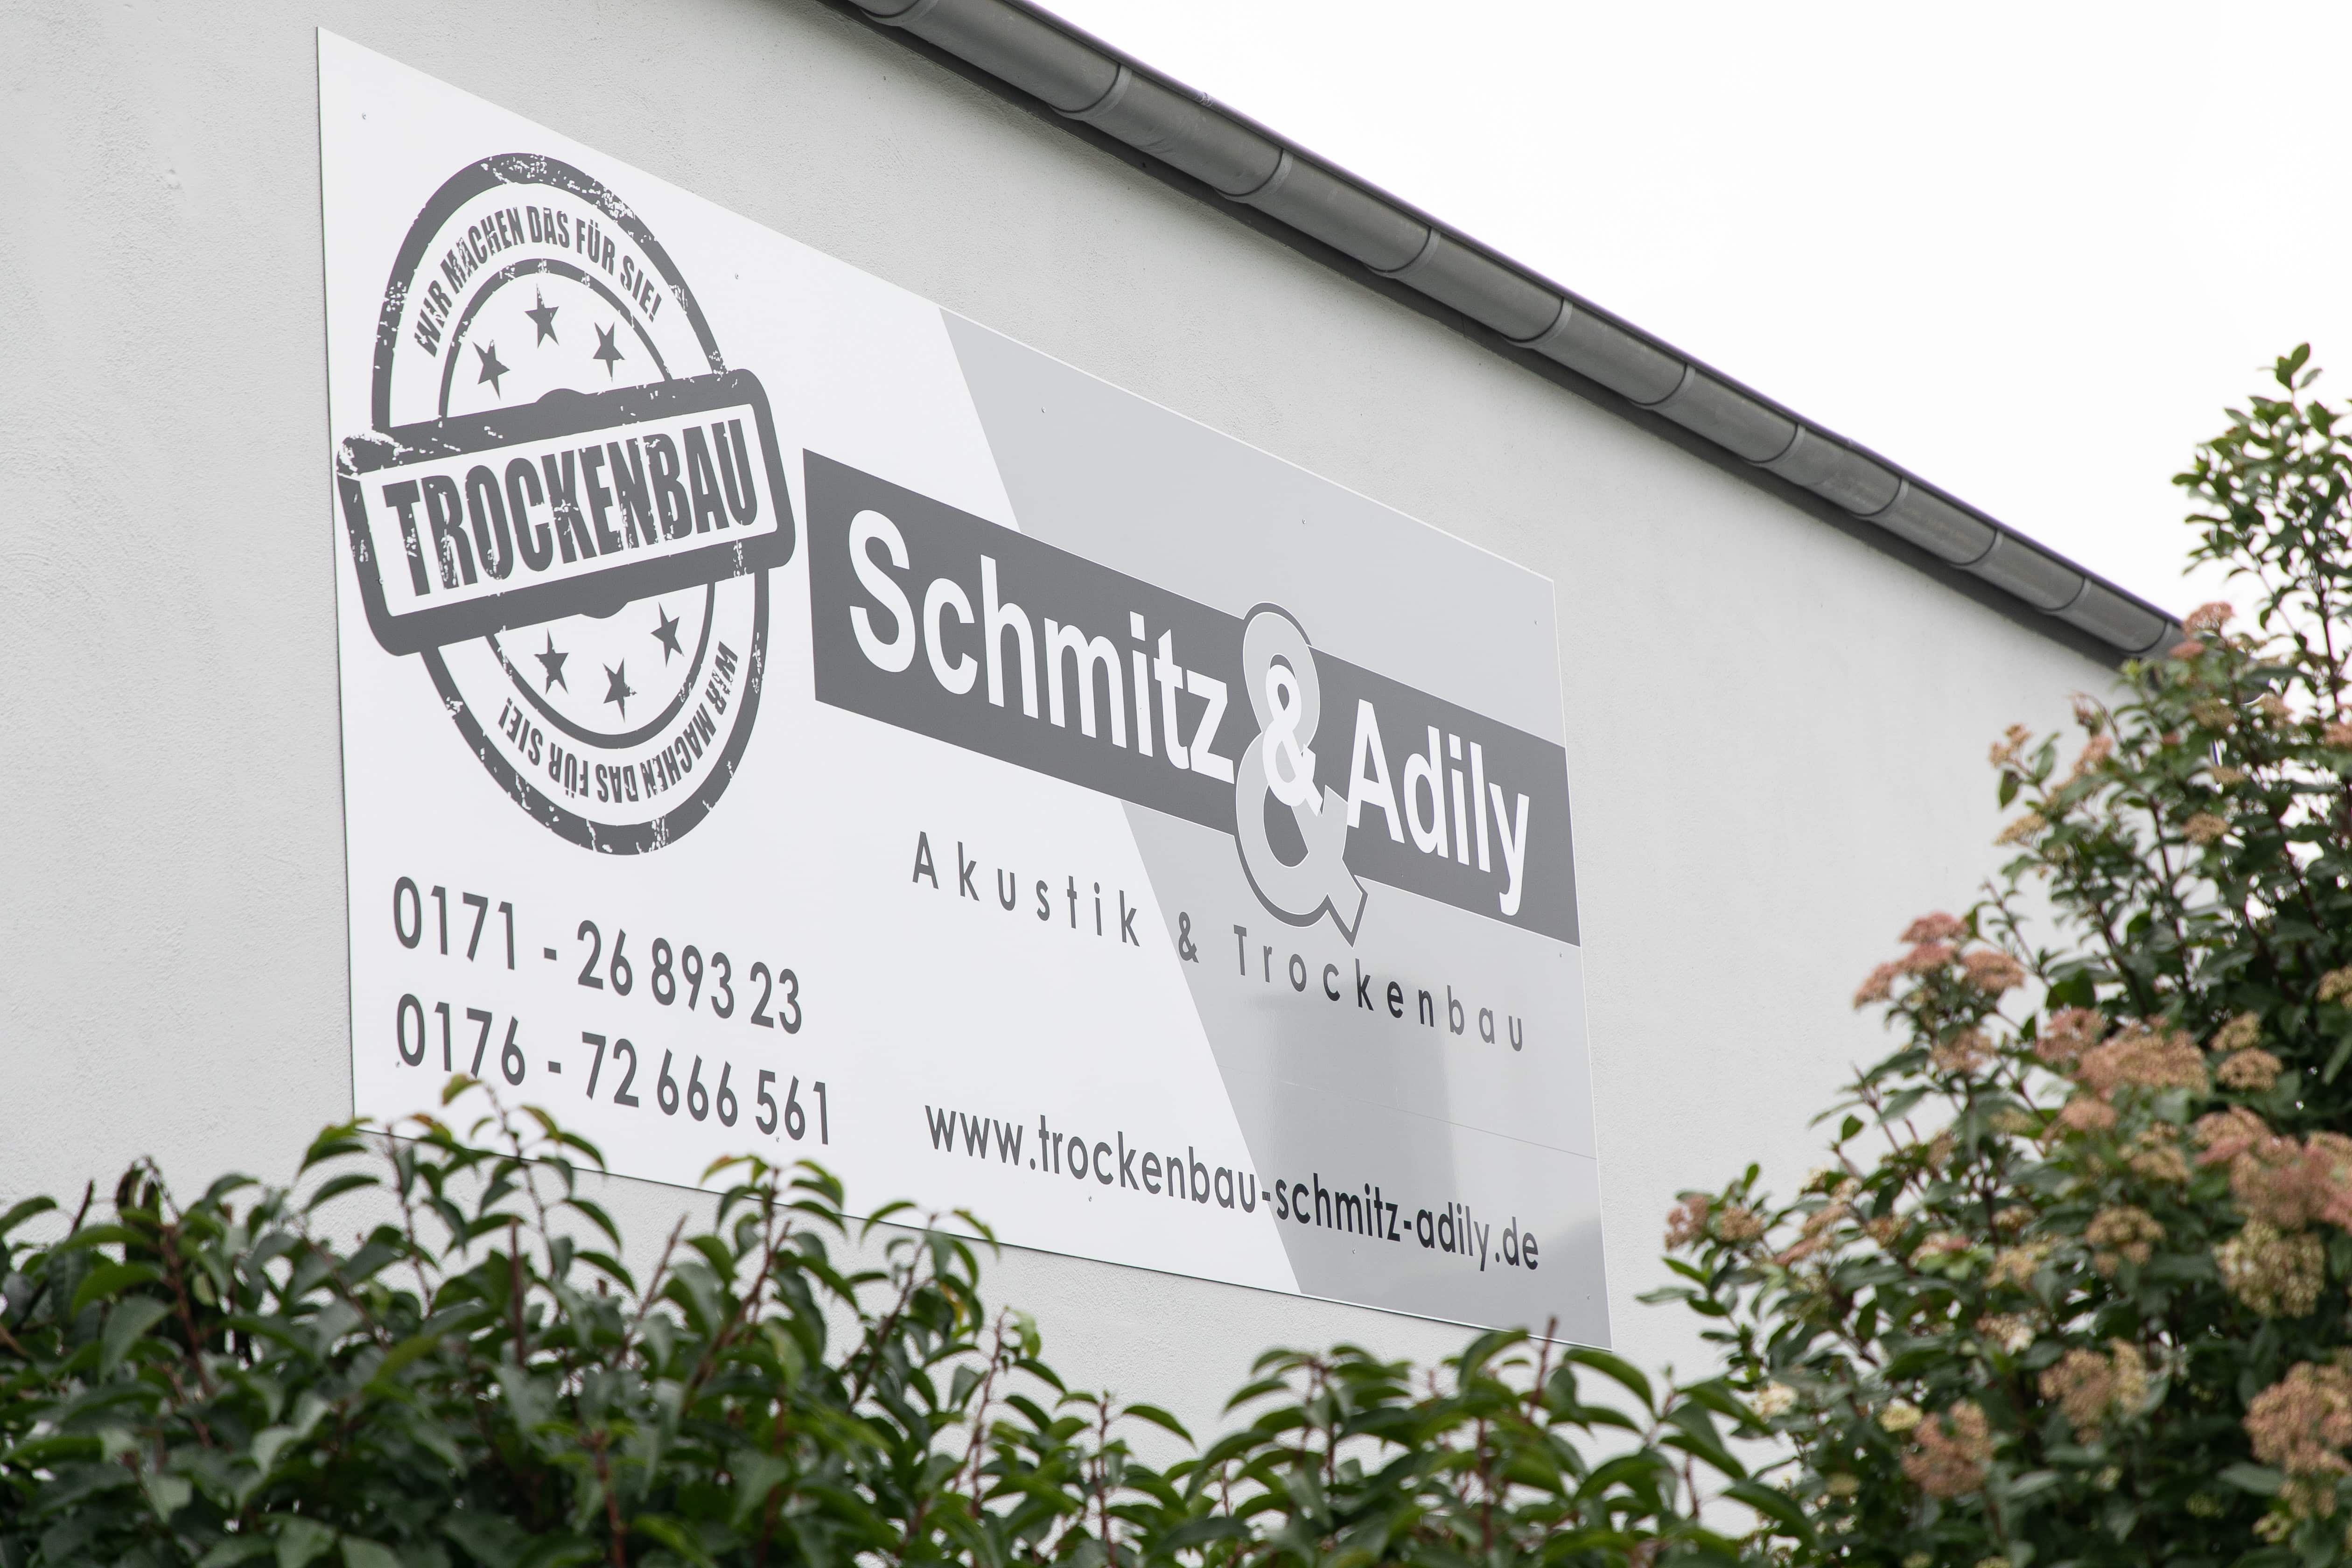 SCHMITZ & ADILY Akustik & Trockenbauarbeiten